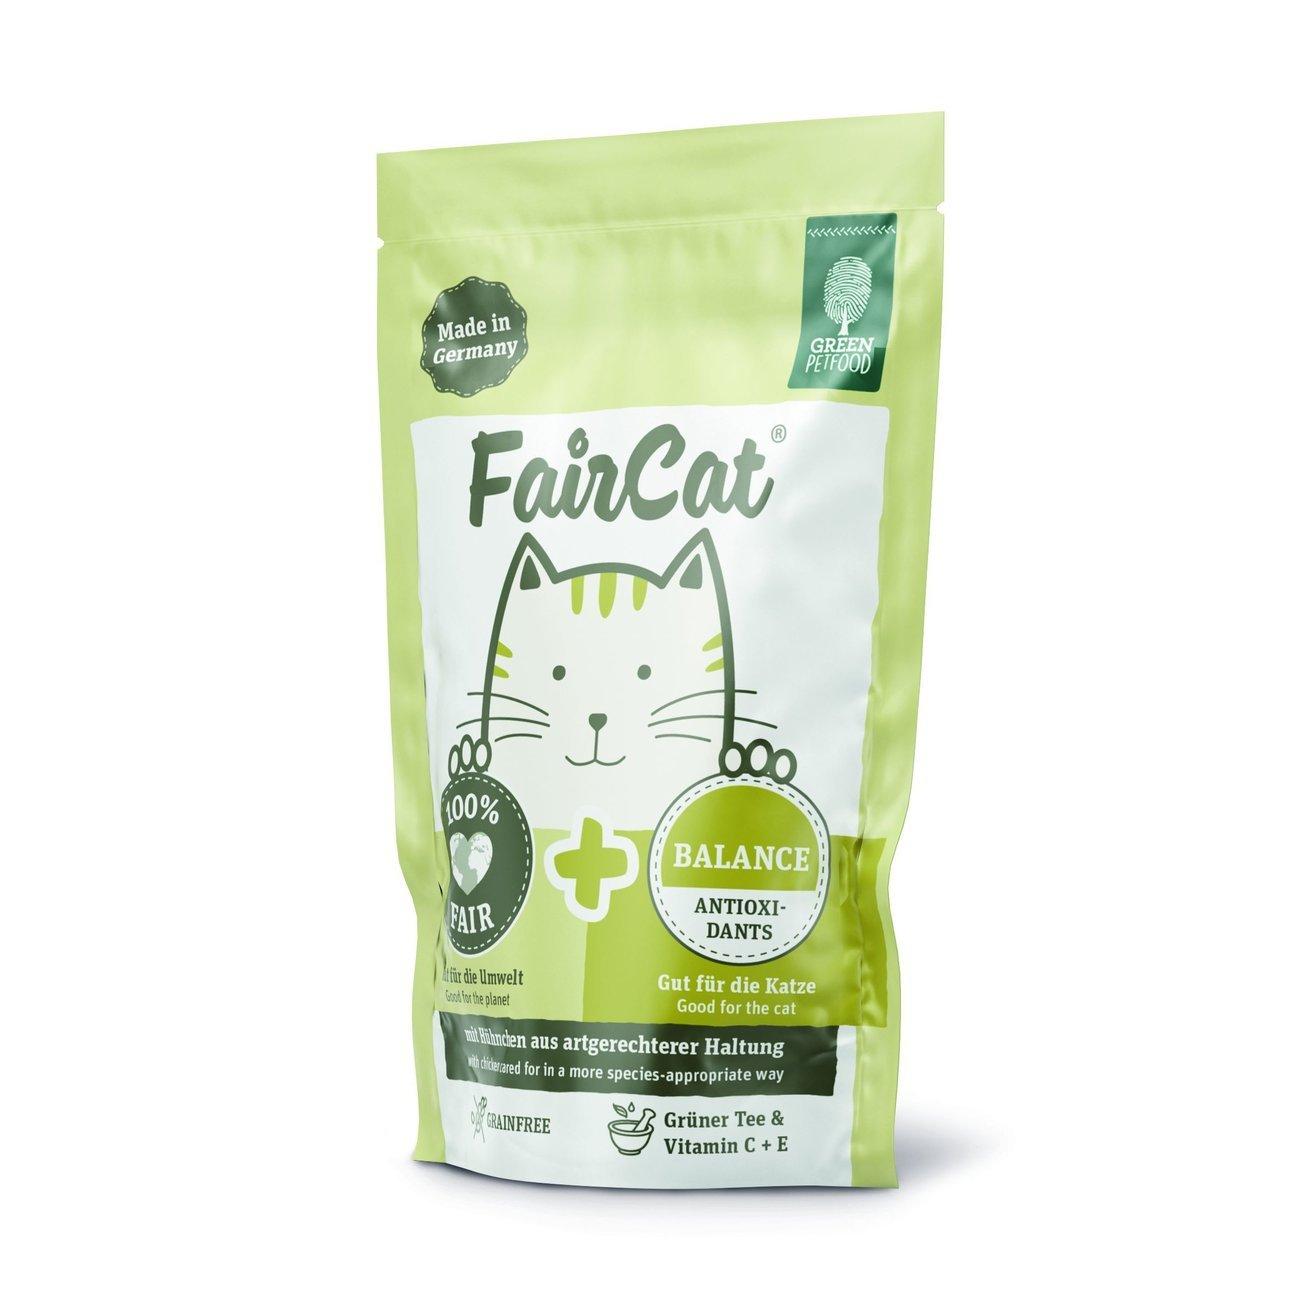 Green Petfood FairCat Balance Katzenfutter, Bild 2